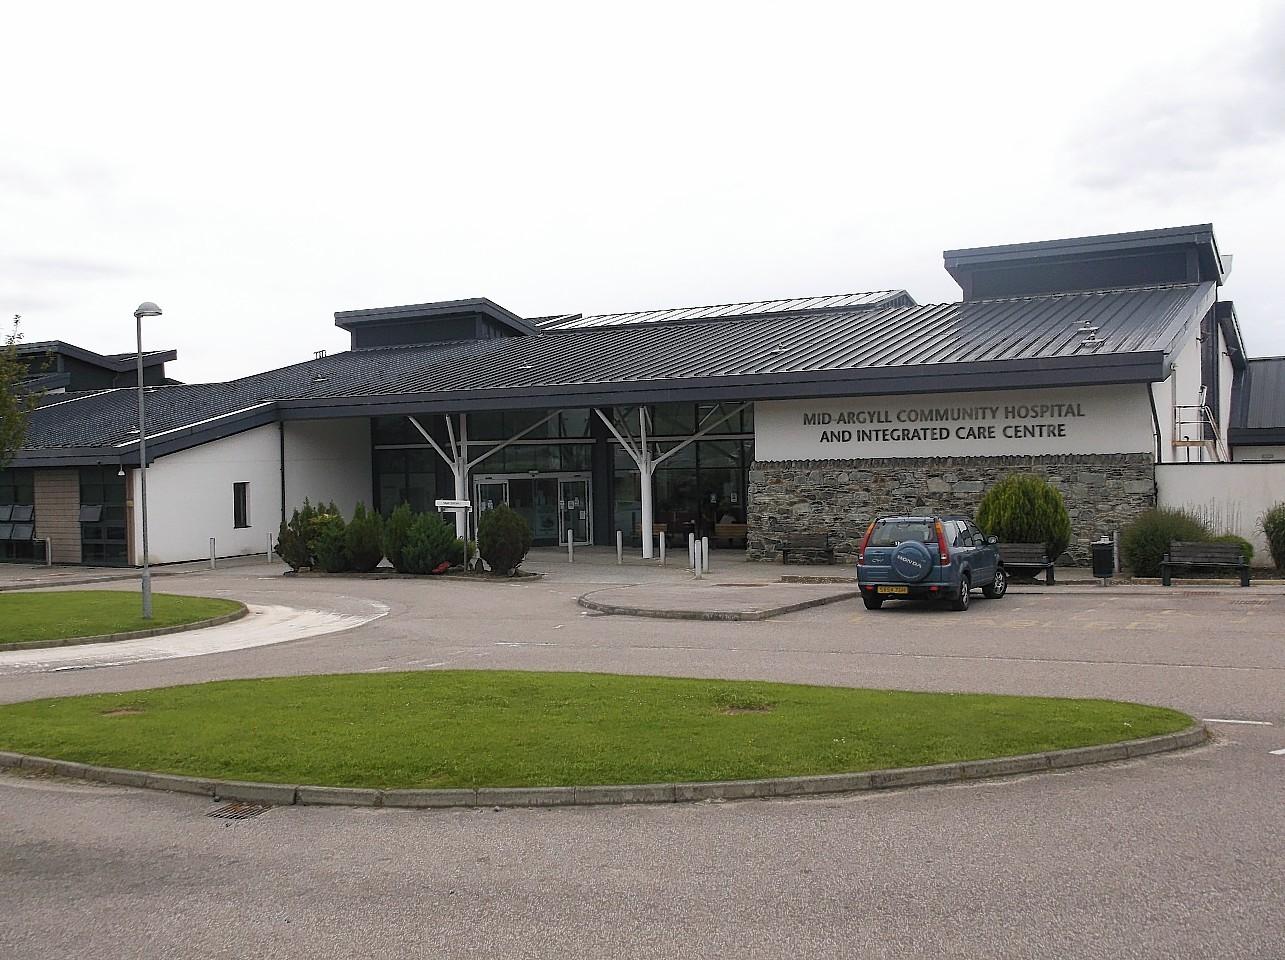 Mid Argyll Community Hospital